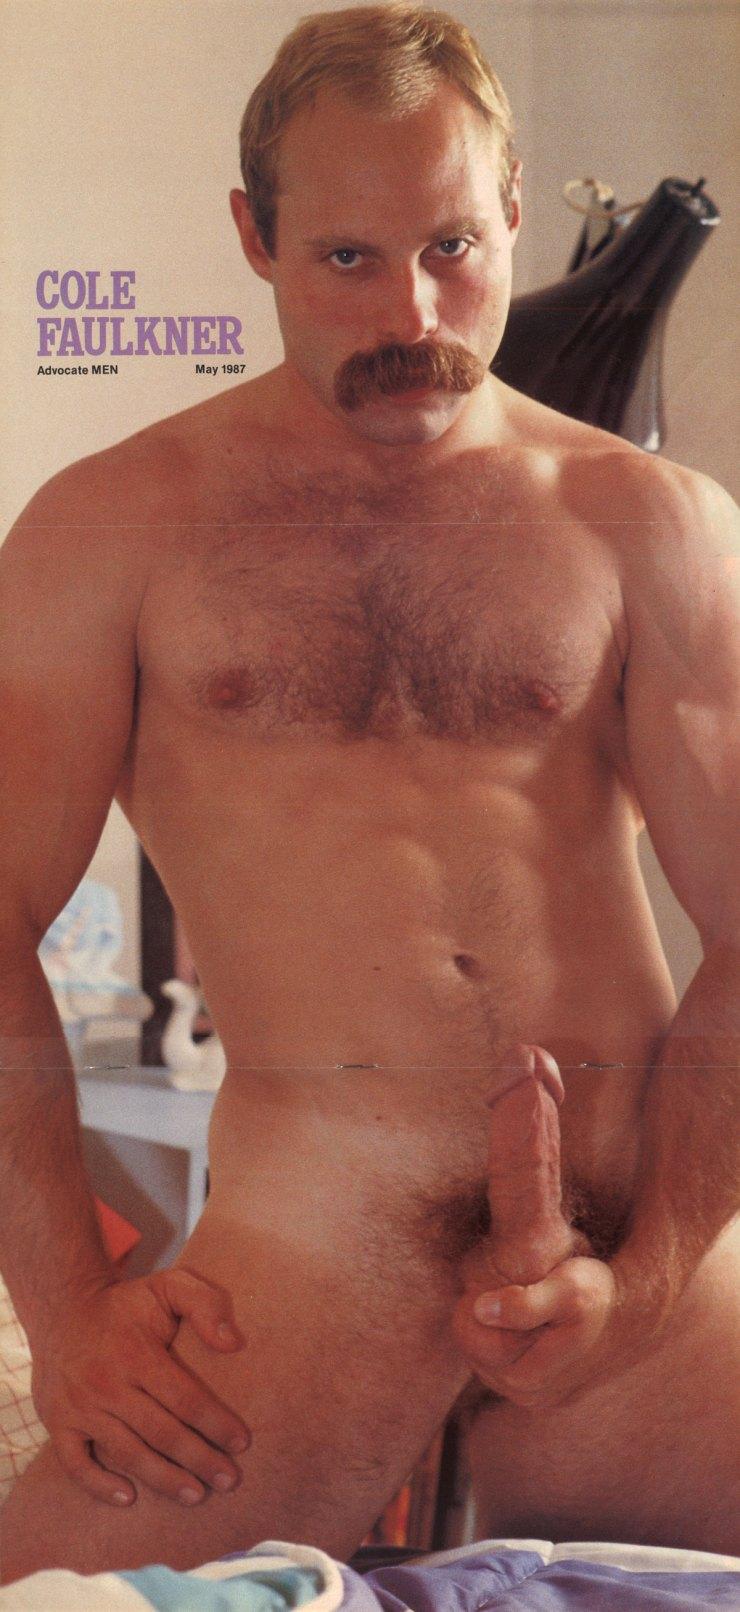 Cole Faulkner vintage gay hot daddy dude men porn